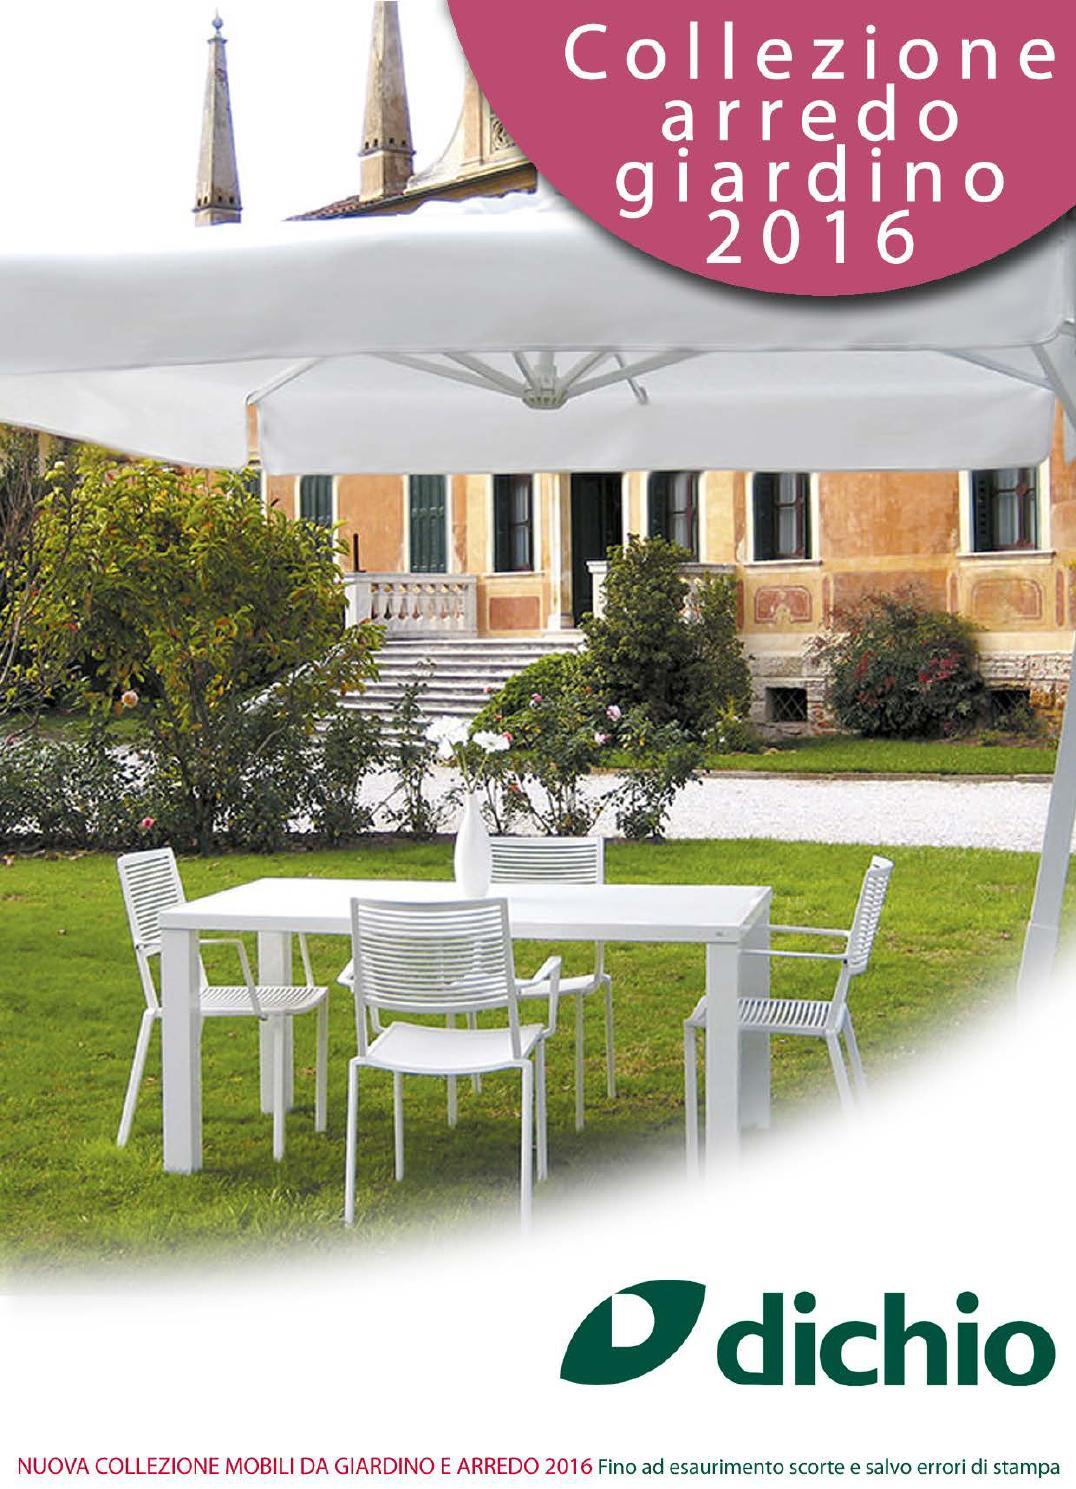 Catalogo dichio arredo giardino 2016 by giovanni dichio for Catalogo giardino